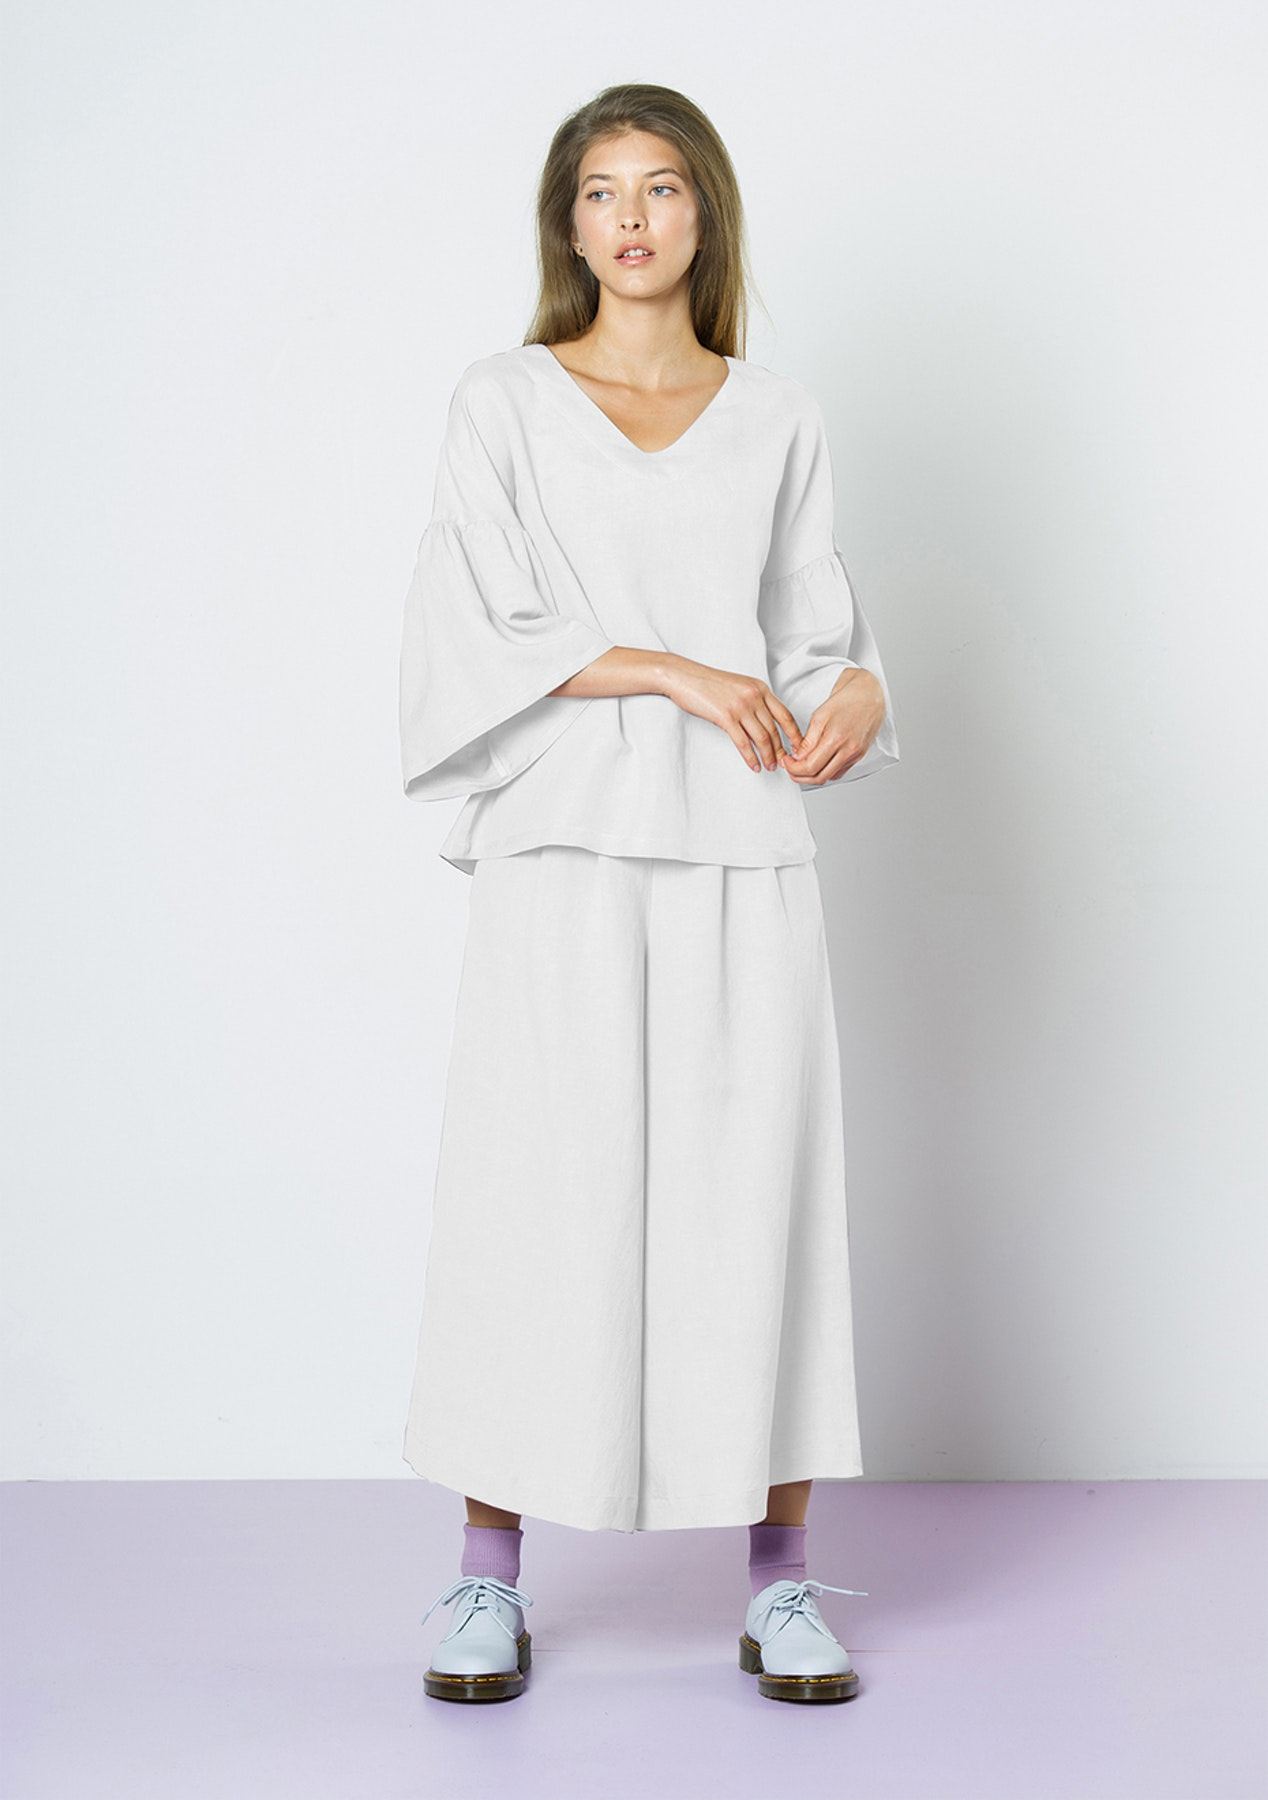 79c68c7a86bee3 Twenty-Seven Names - Waterfalls Linen Top - White - NZ Designer Sale -  Onceit